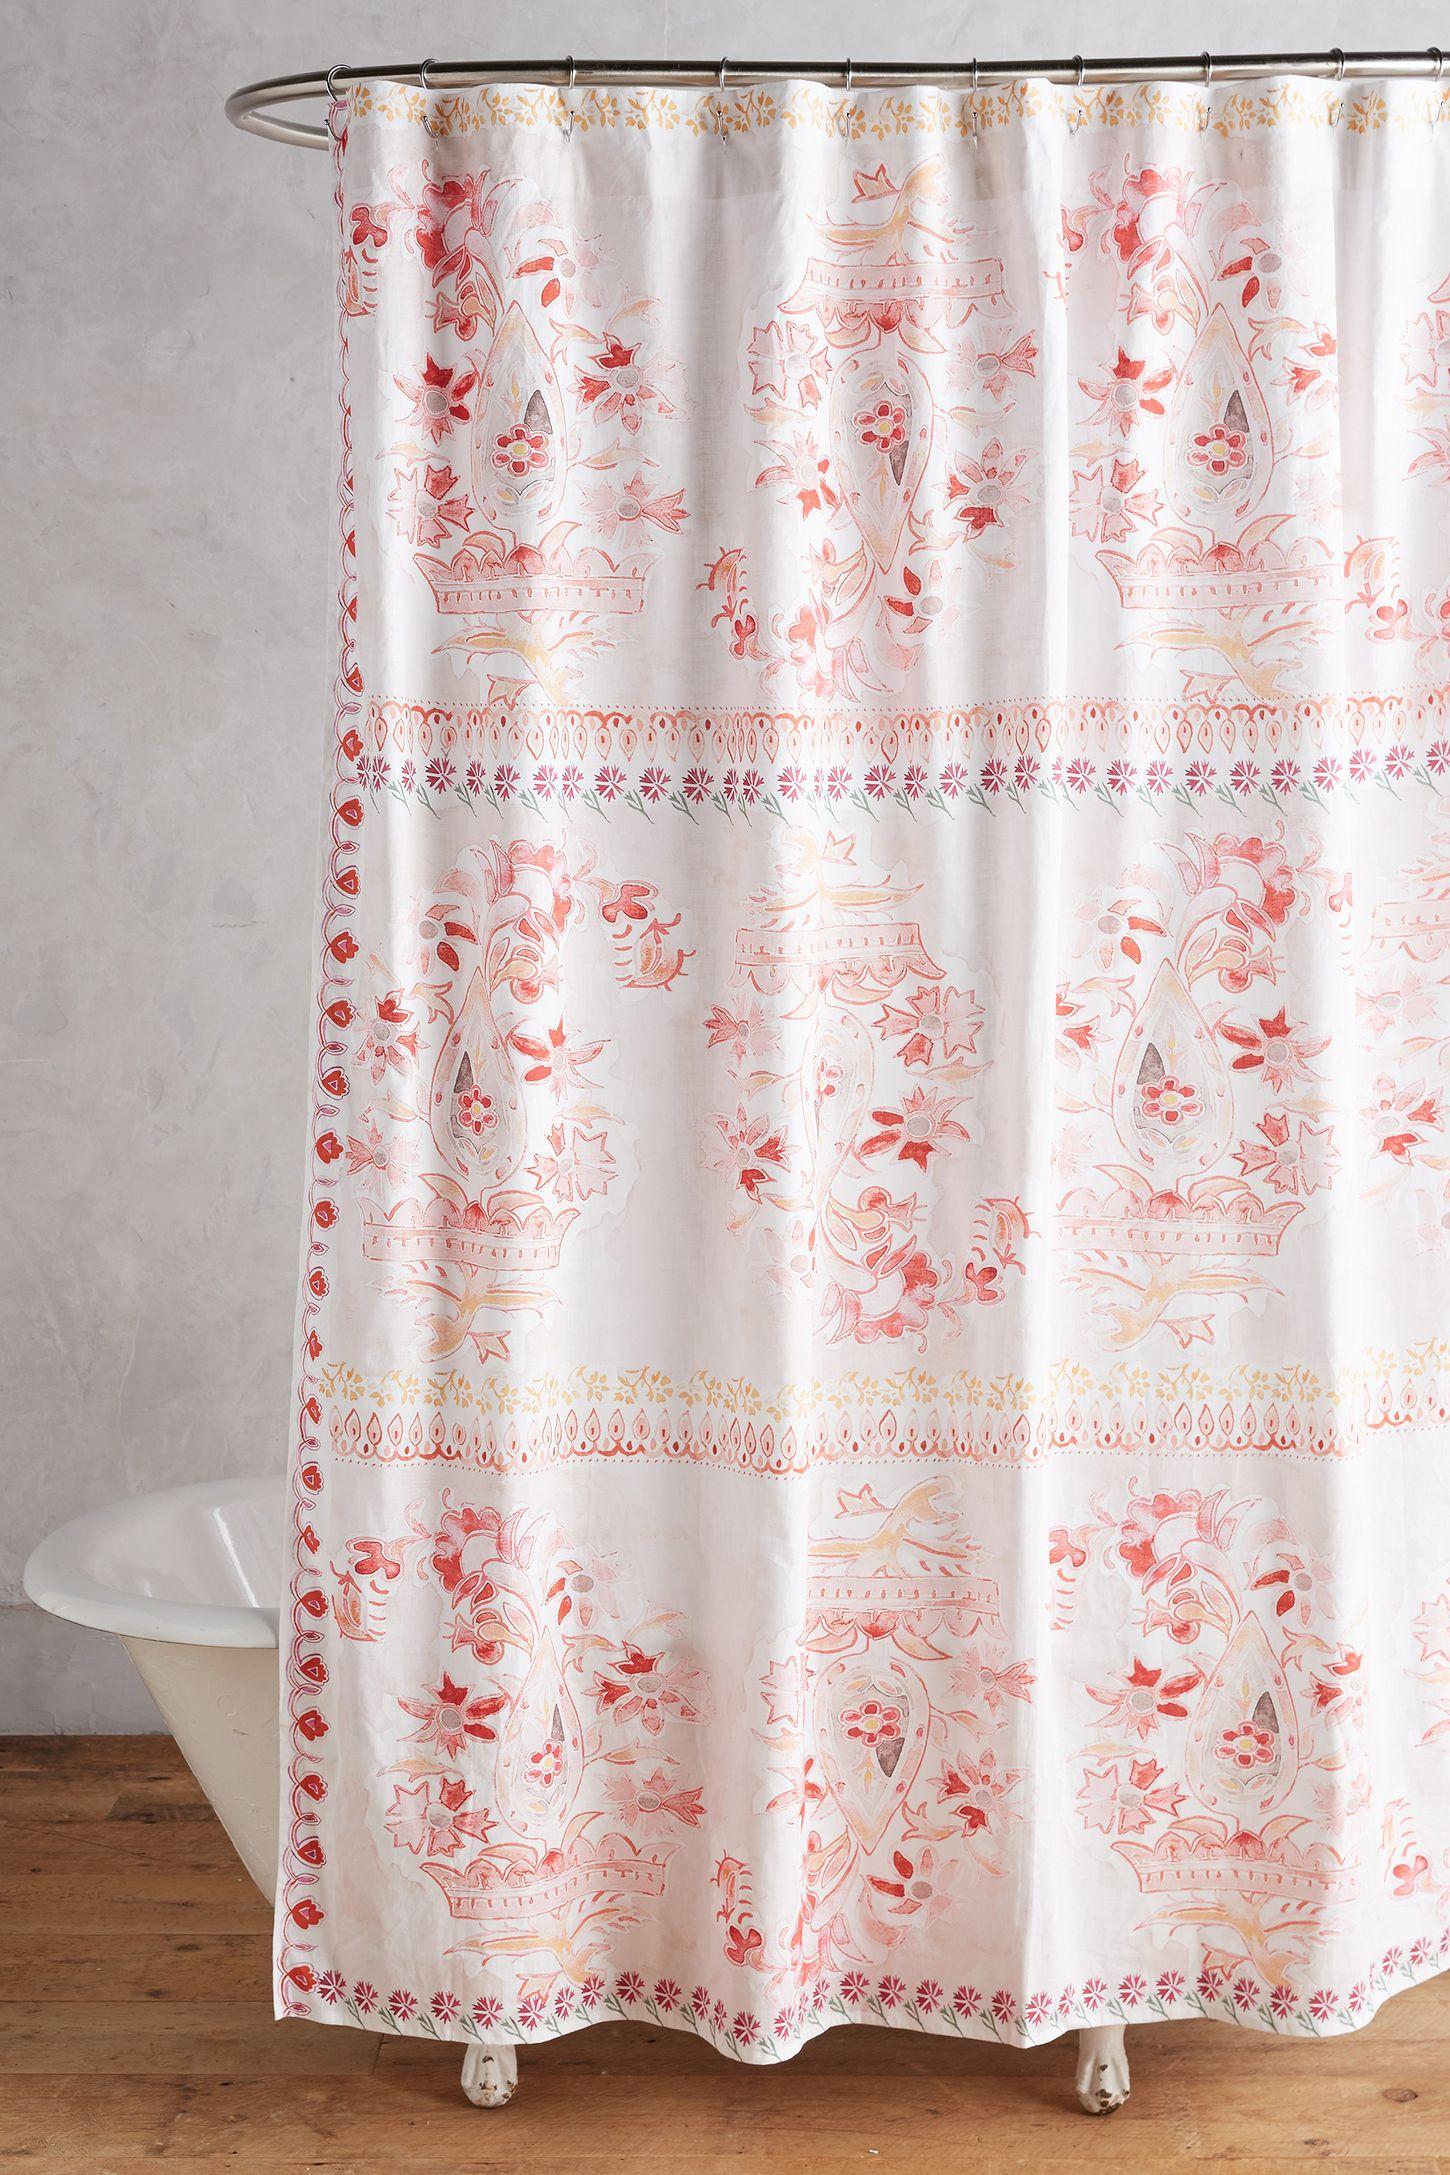 Anthropologie floral shower curtain - Anthropologie Floral Shower Curtain 55